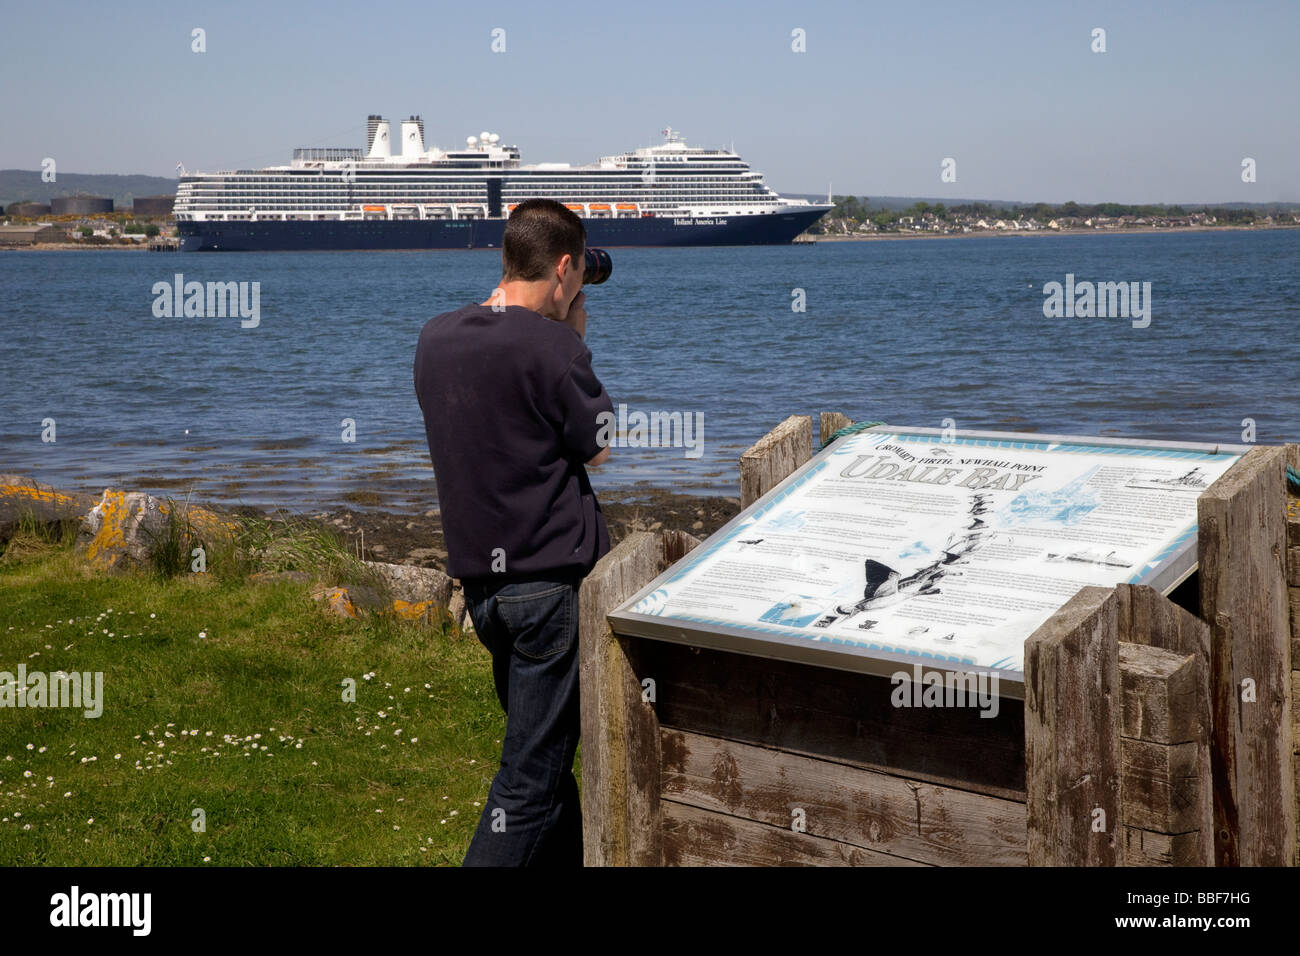 Eurodam cruise liner moored at Invergordon, Cromarty Firth, Scotland, UK - Stock Image